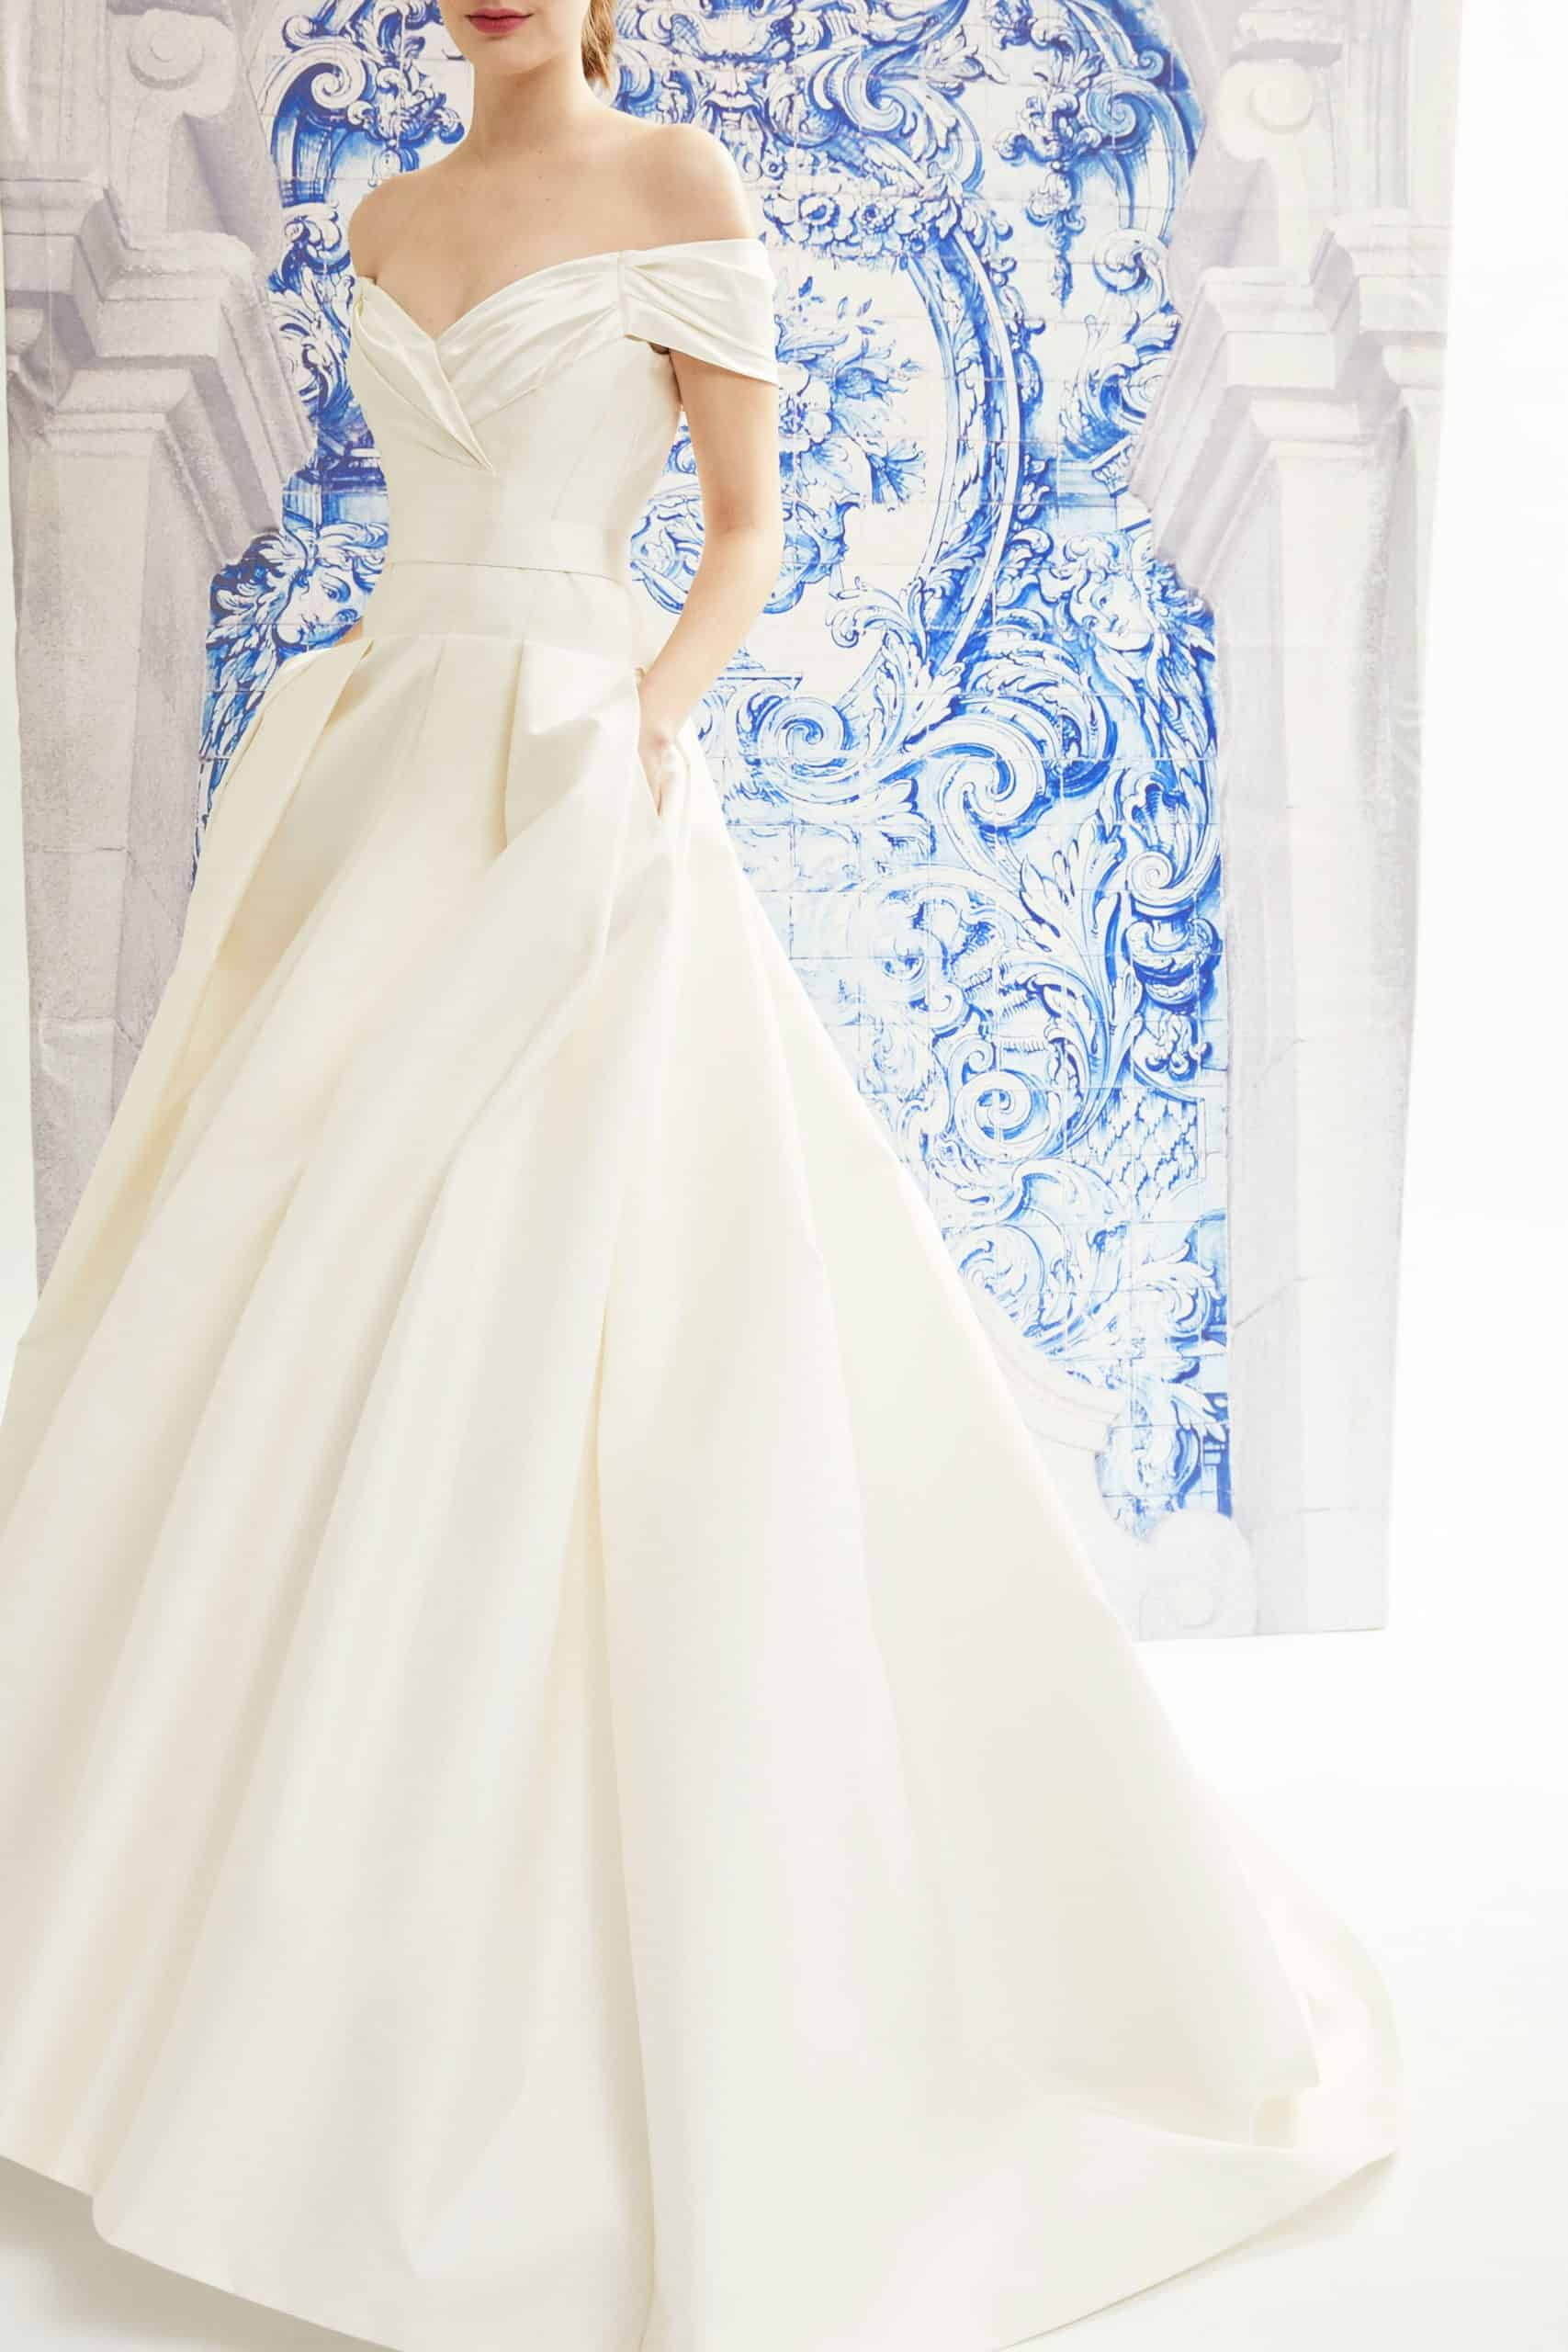 classic princess wedding dress by Carolina Herrera